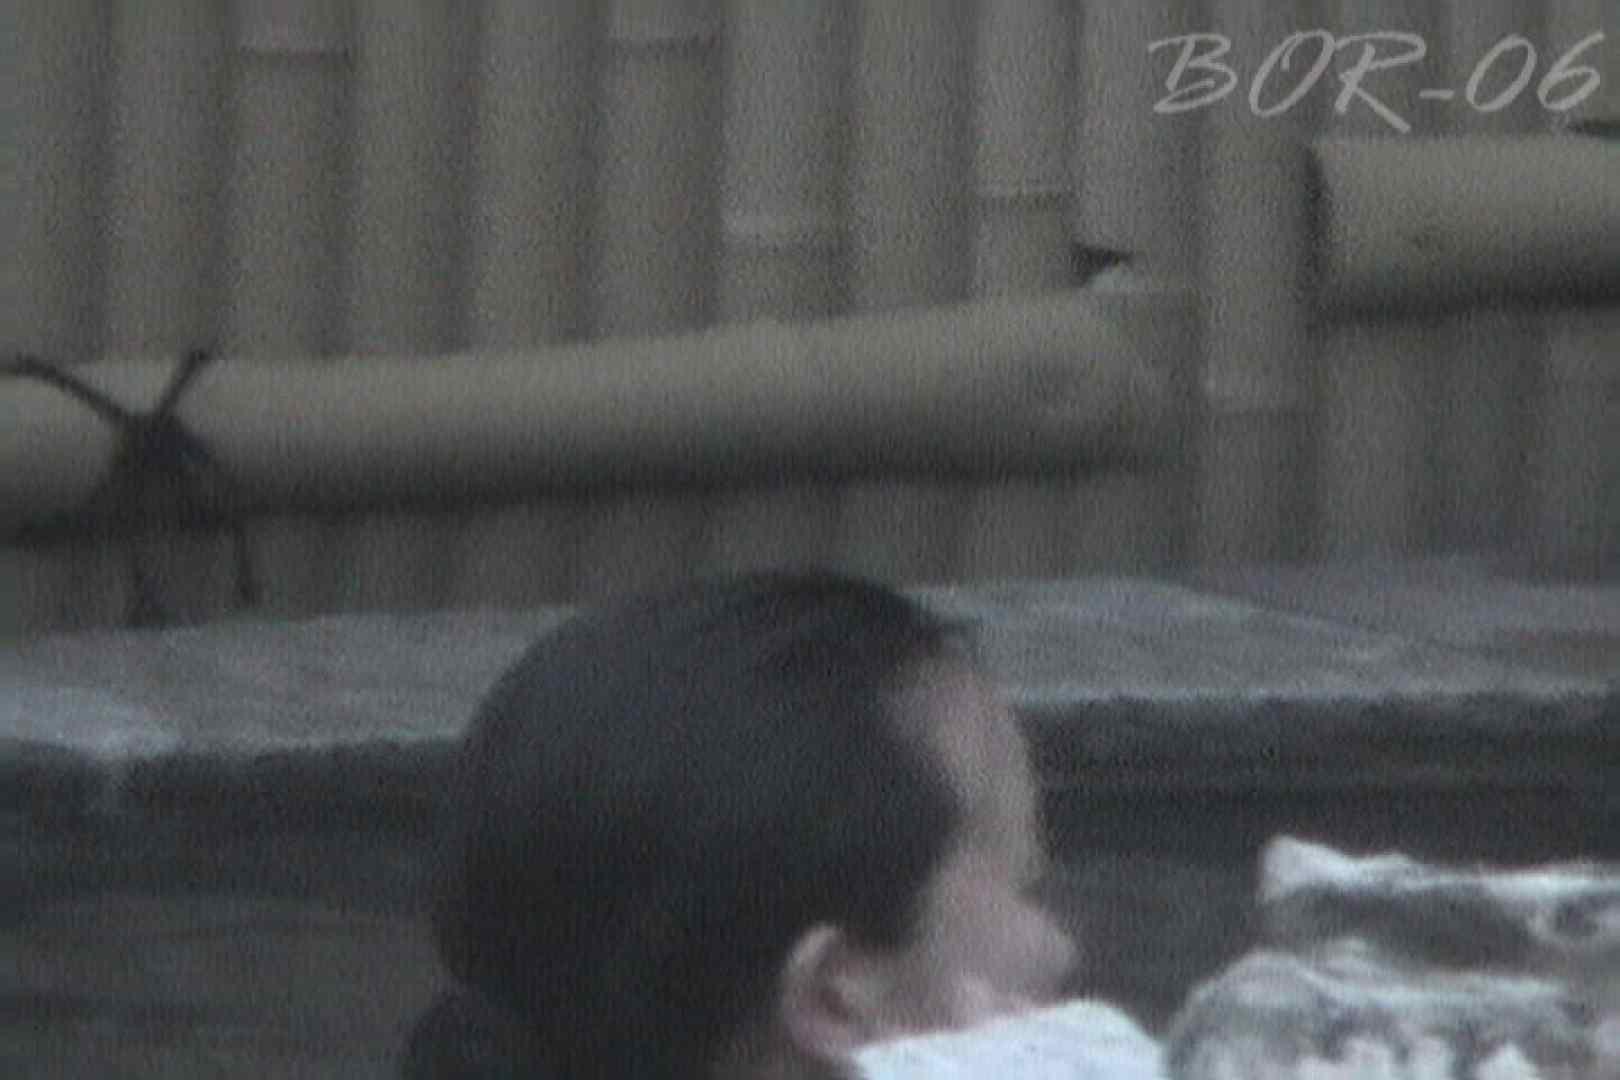 Aquaな露天風呂Vol.519 露天覗き おめこ無修正動画無料 85枚